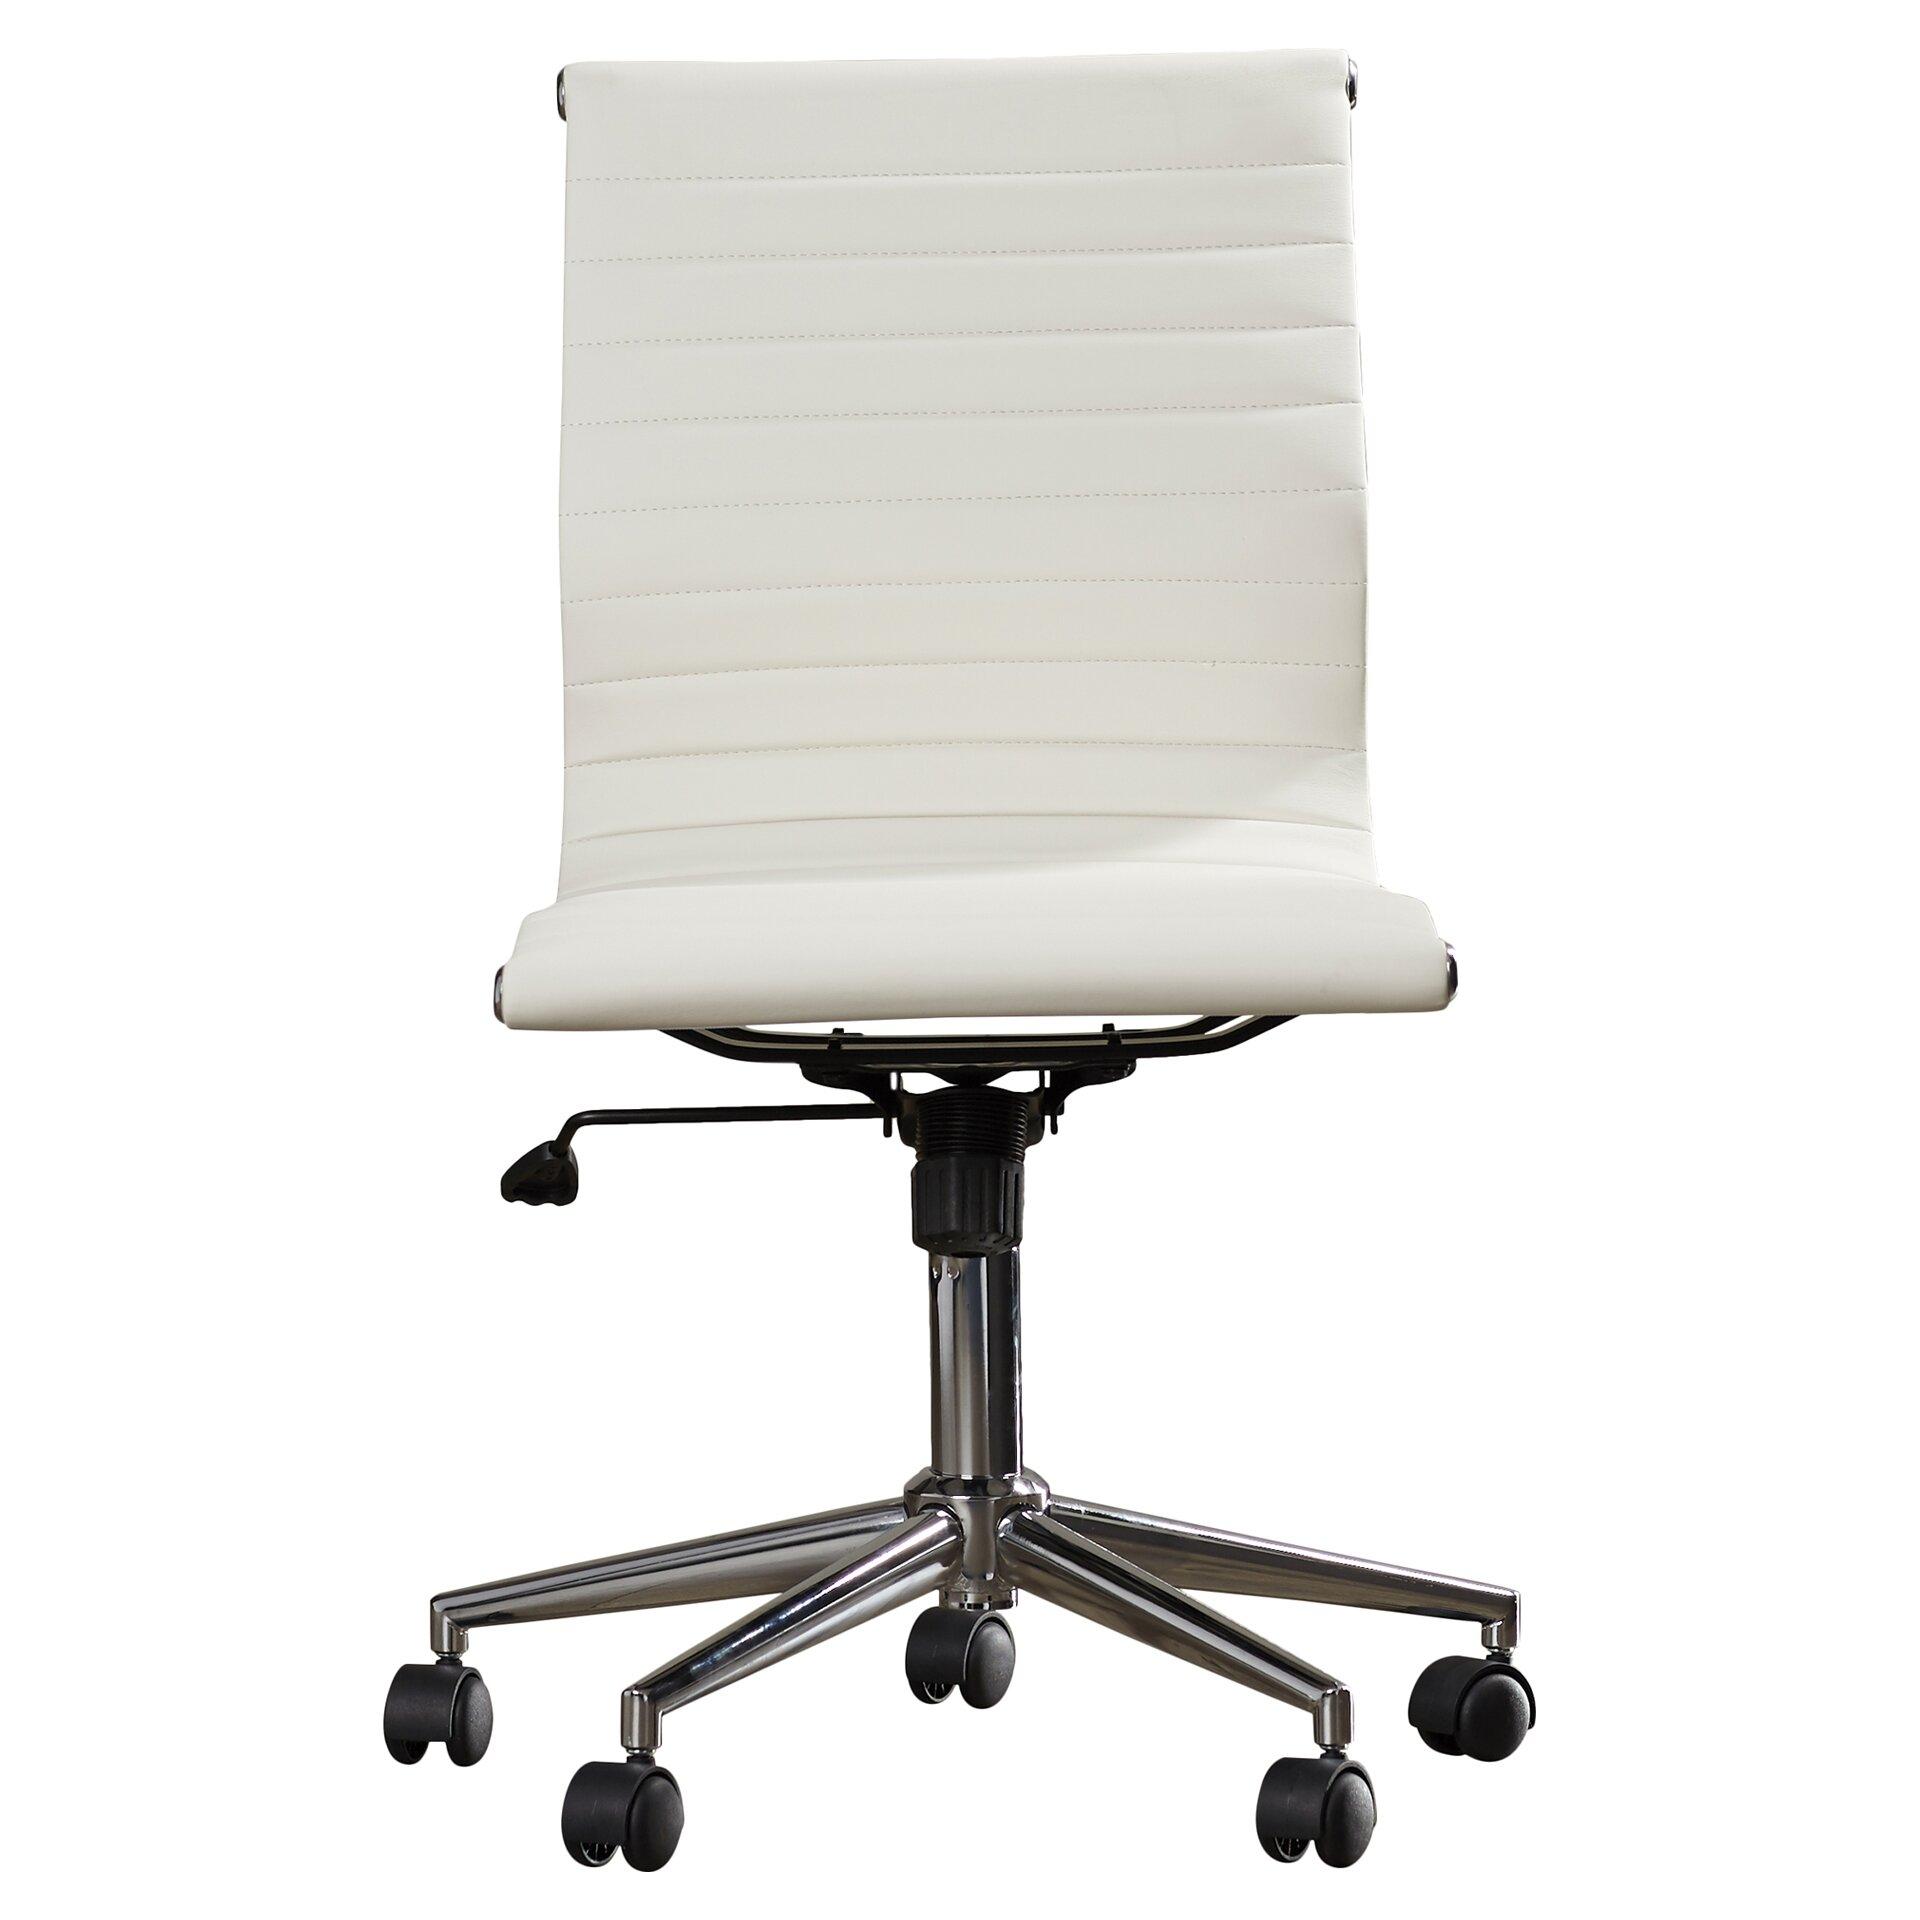 Varick Gallery Willowridge Mid Back Adjustable Office Chair Reviews W